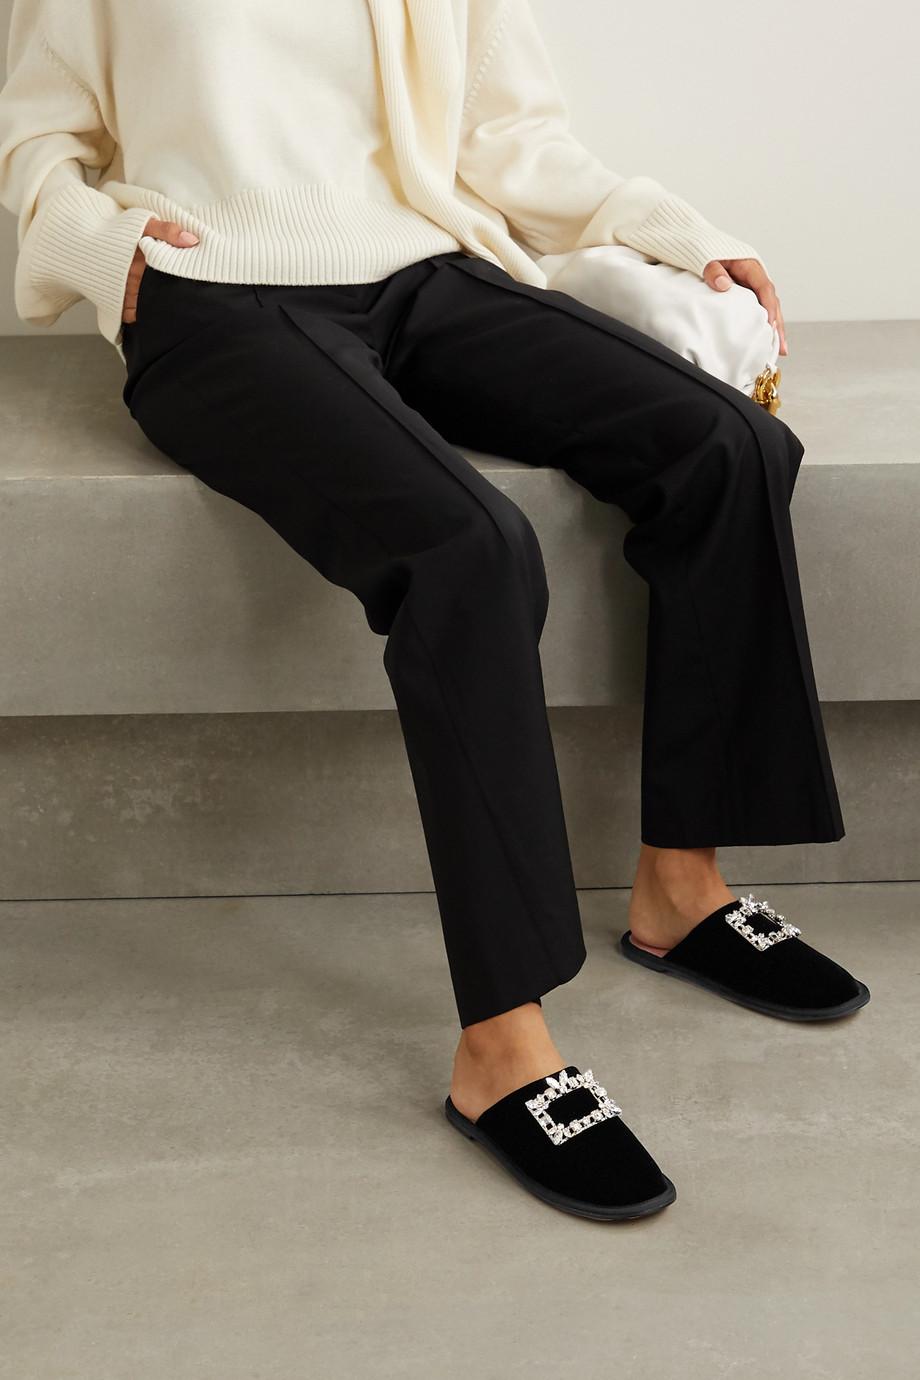 Roger Vivier Hotel Vivier crystal-embellished velvet slippers